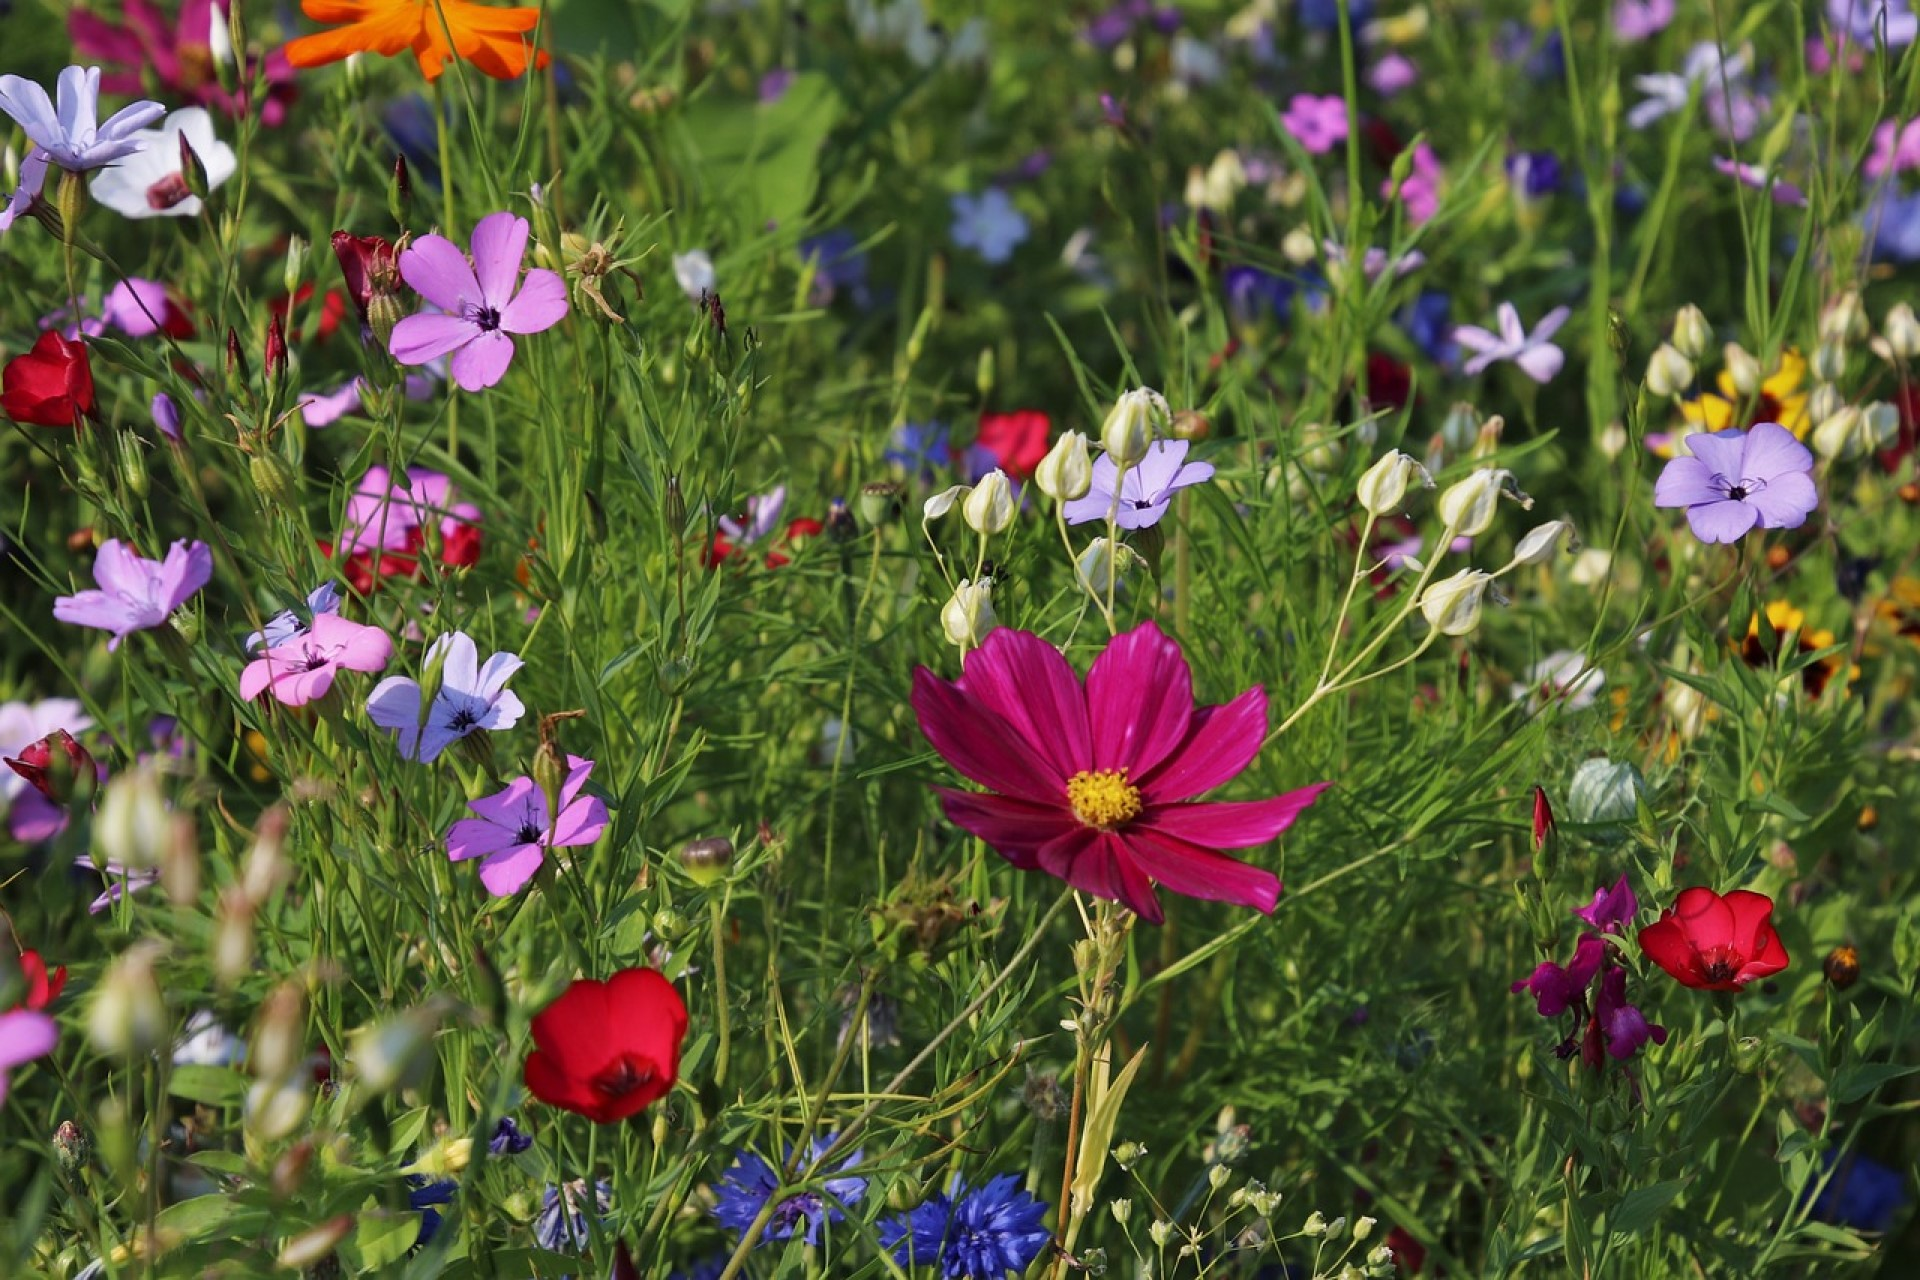 How To Increase Genetic Diversity Through Native Gardening